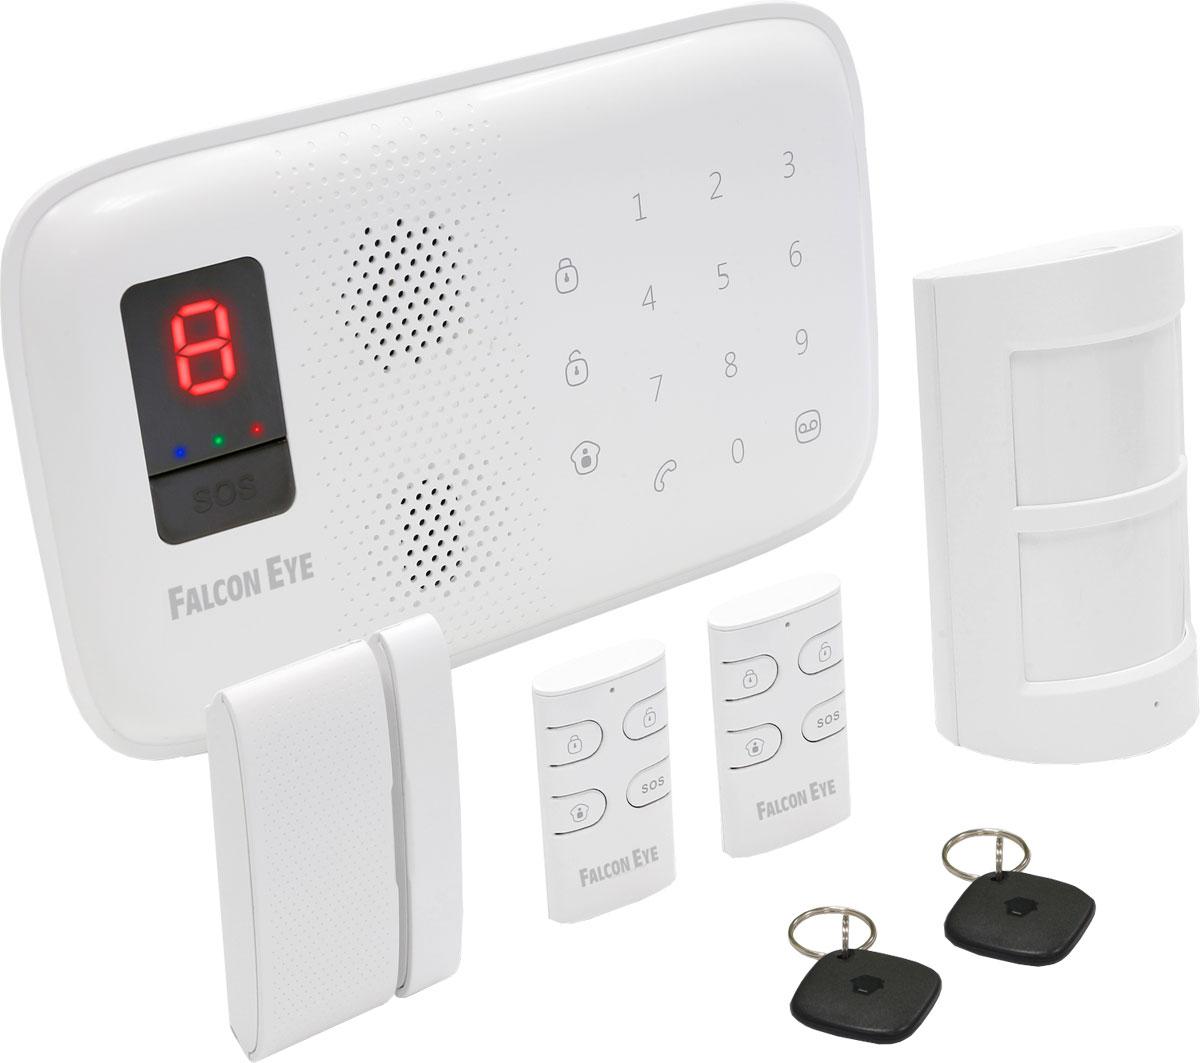 Falcon Eye FE MagicTouch комплект беспроводной GSM-сигнализации